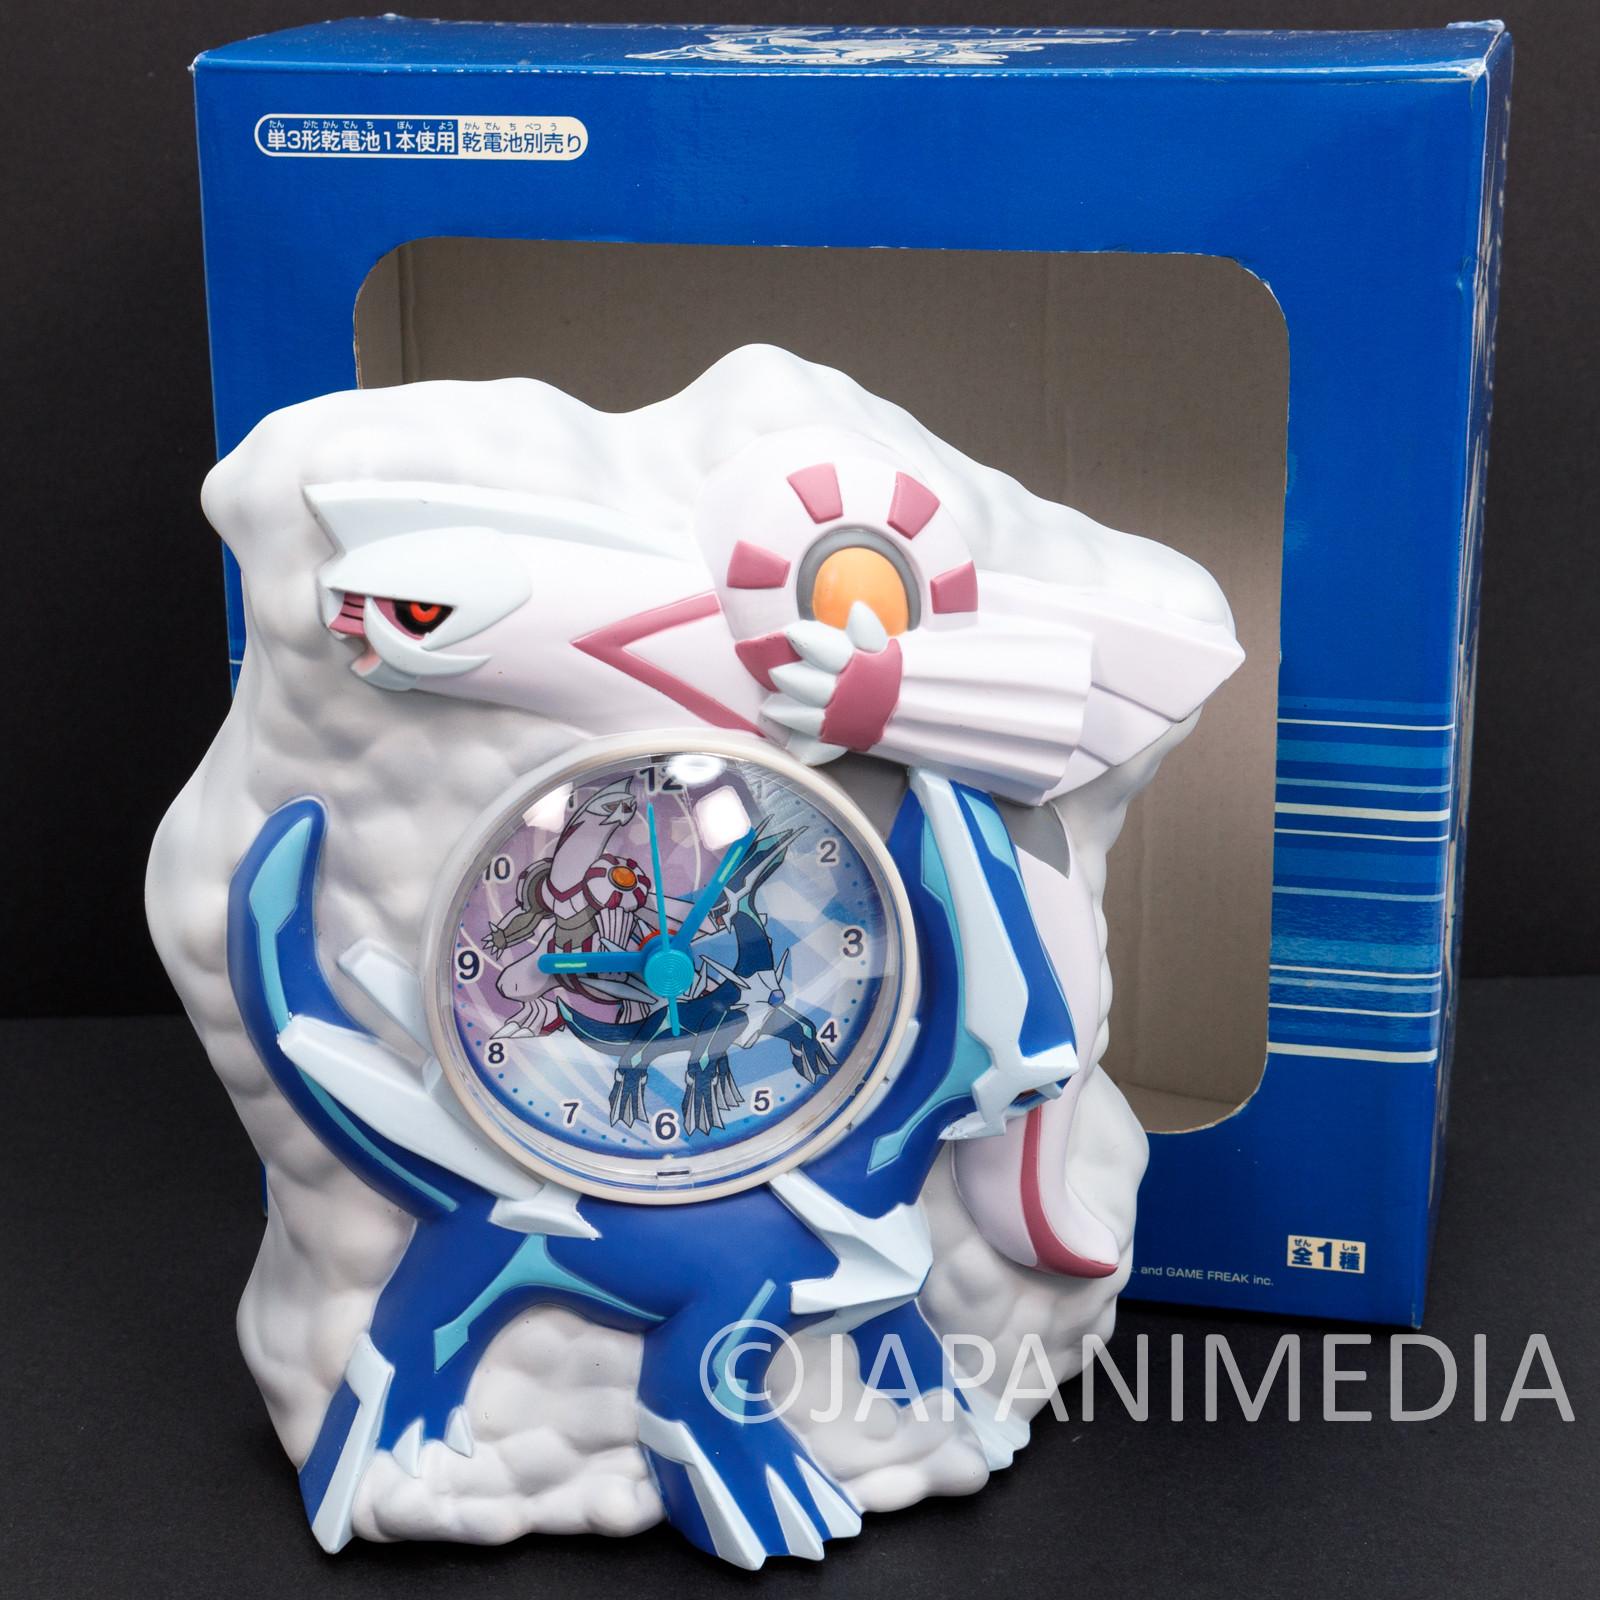 RARE! Pokemon Palkia & Dialga Alarm Clock Pocket Monsters JAPAN ANIME MANGA